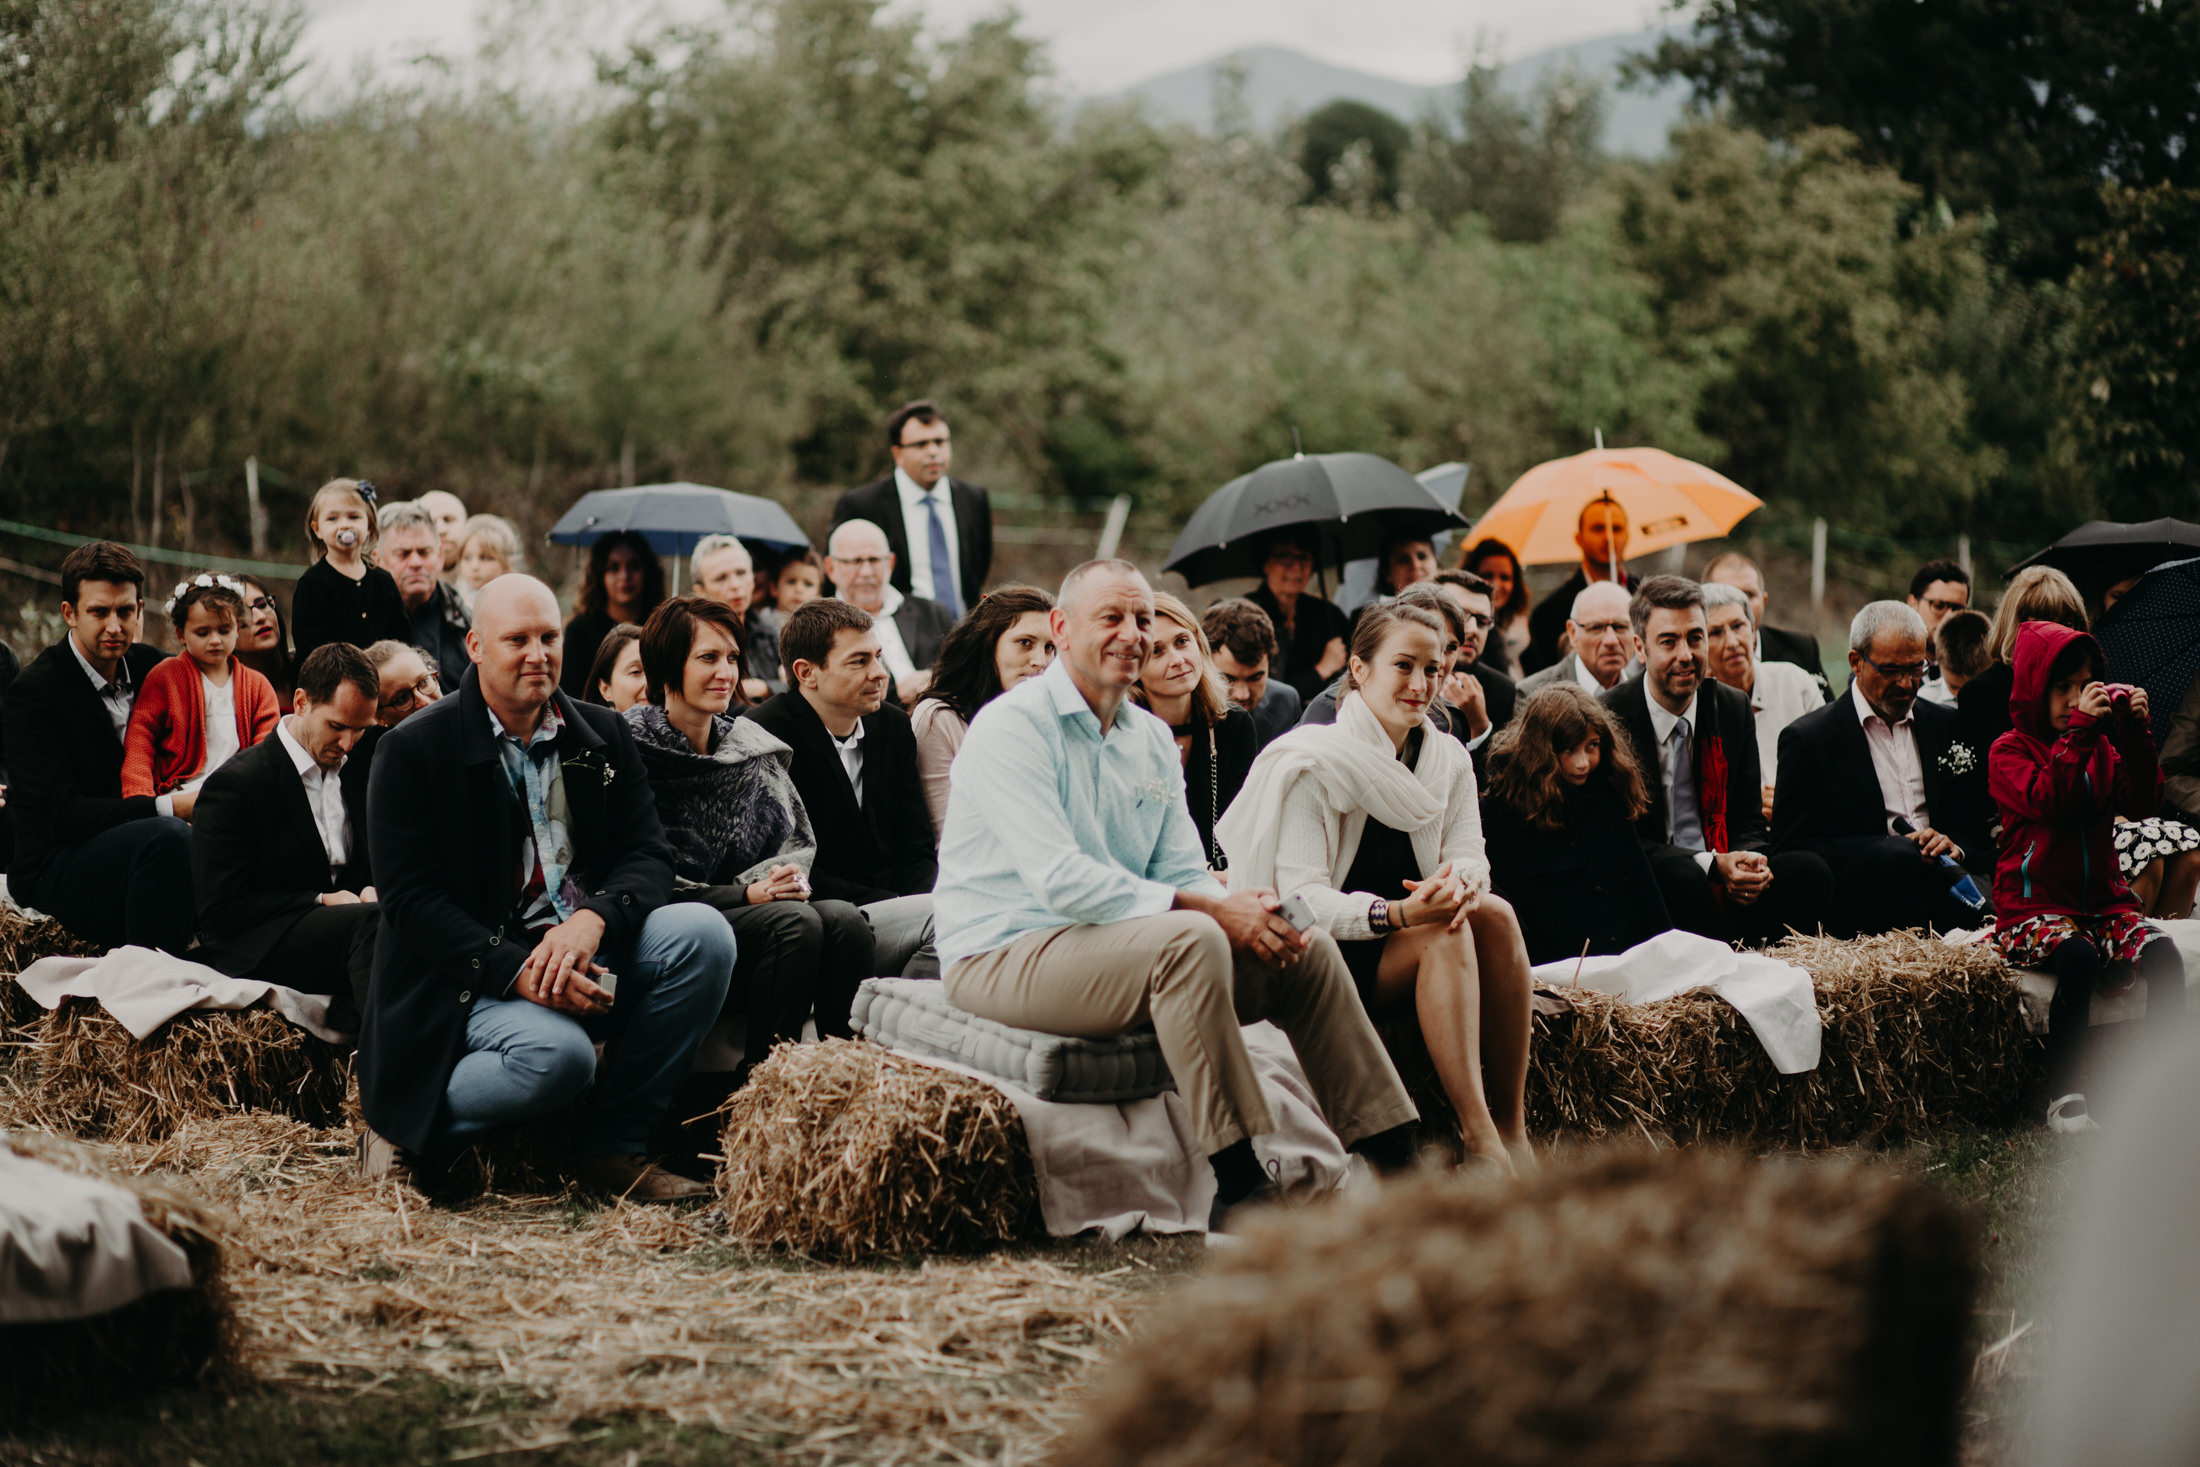 Mariage alsace germany wedding kid-43.jpg